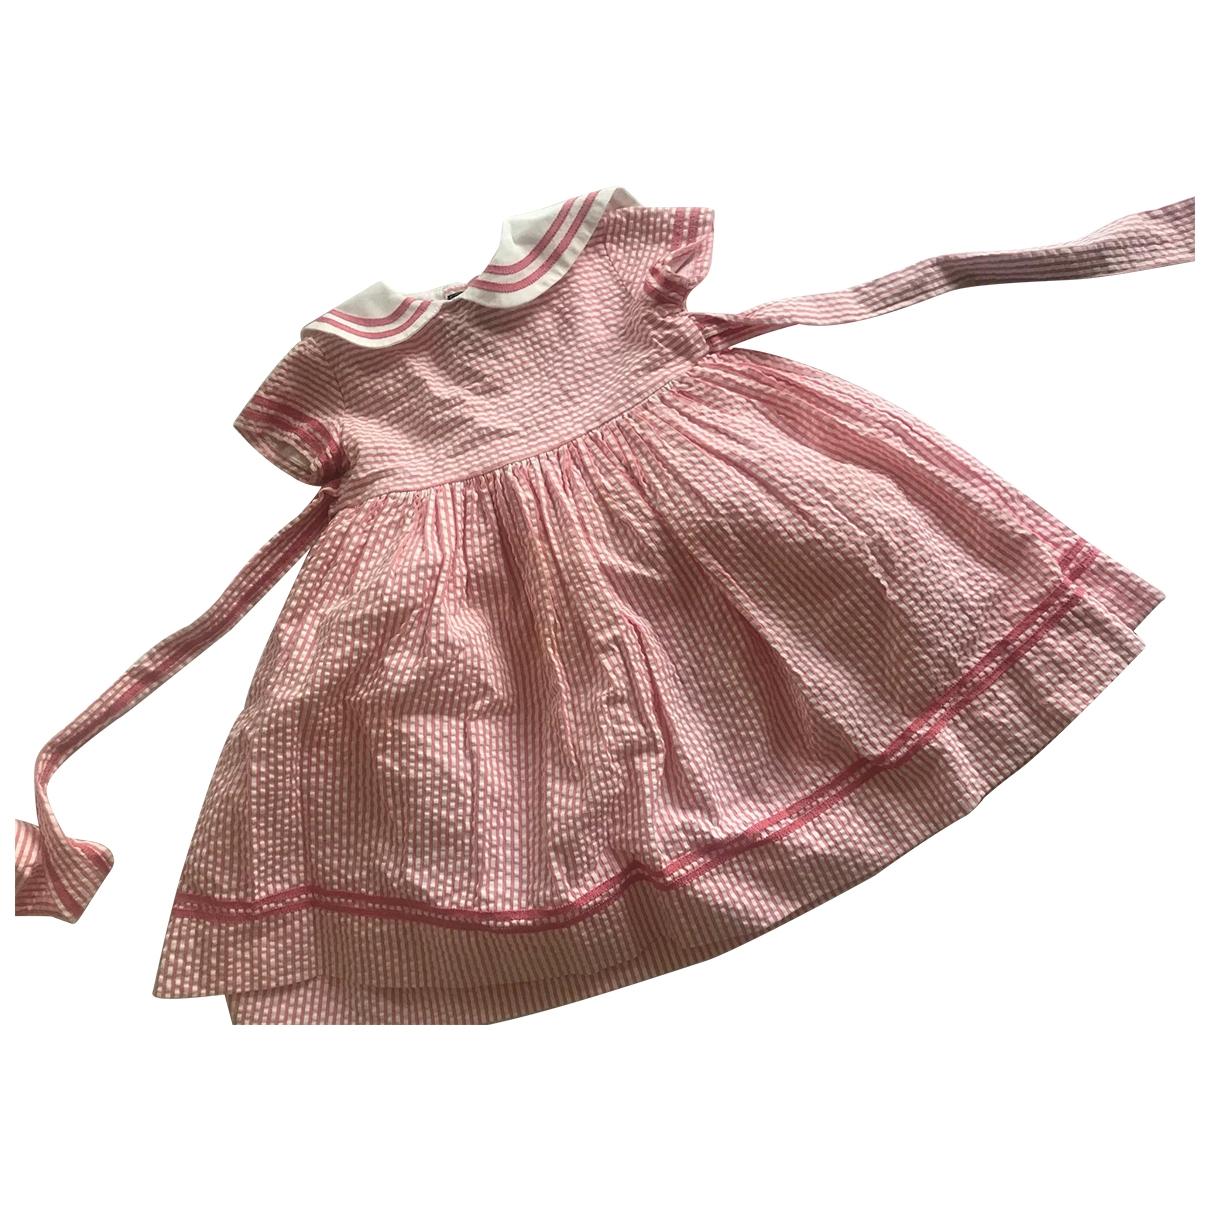 Oscar De La Renta \N Pink Cotton dress for Kids 18 months - until 32 inches UK